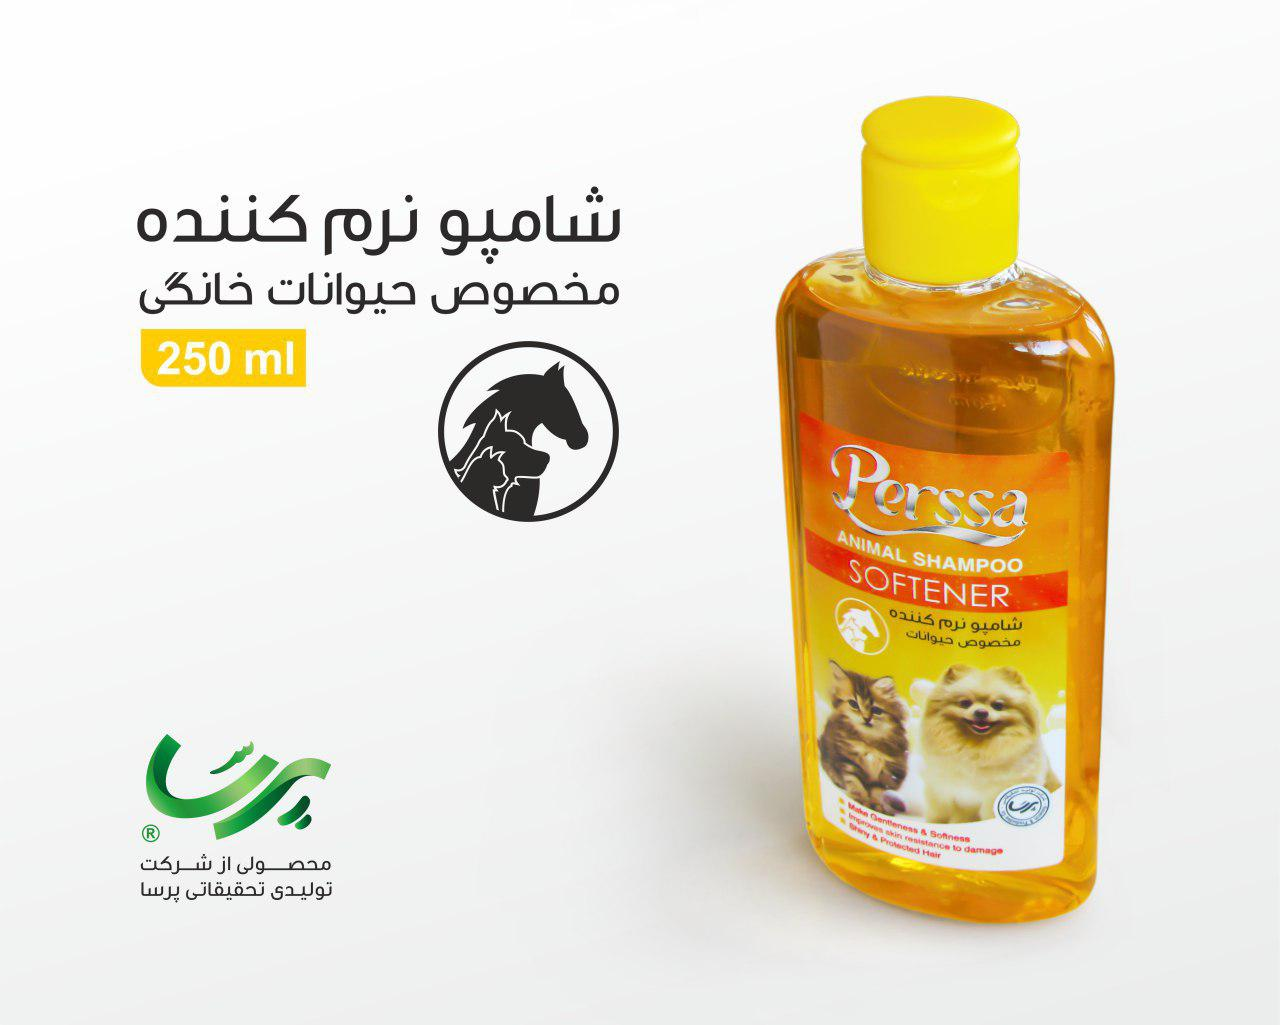 softener shampoo